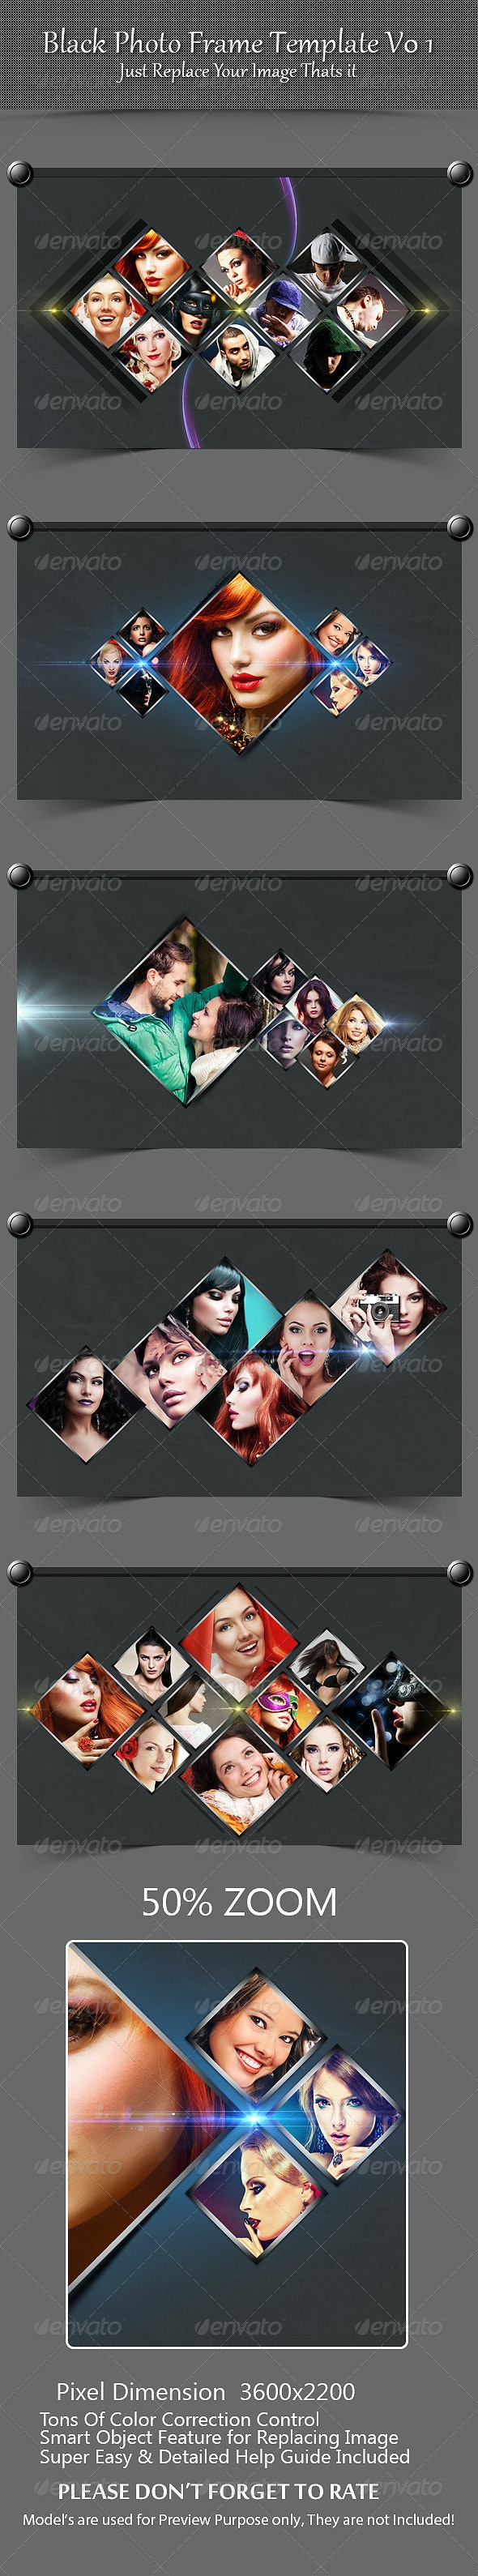 Black Photo Frame Template V01 - Photo Templates Graphics